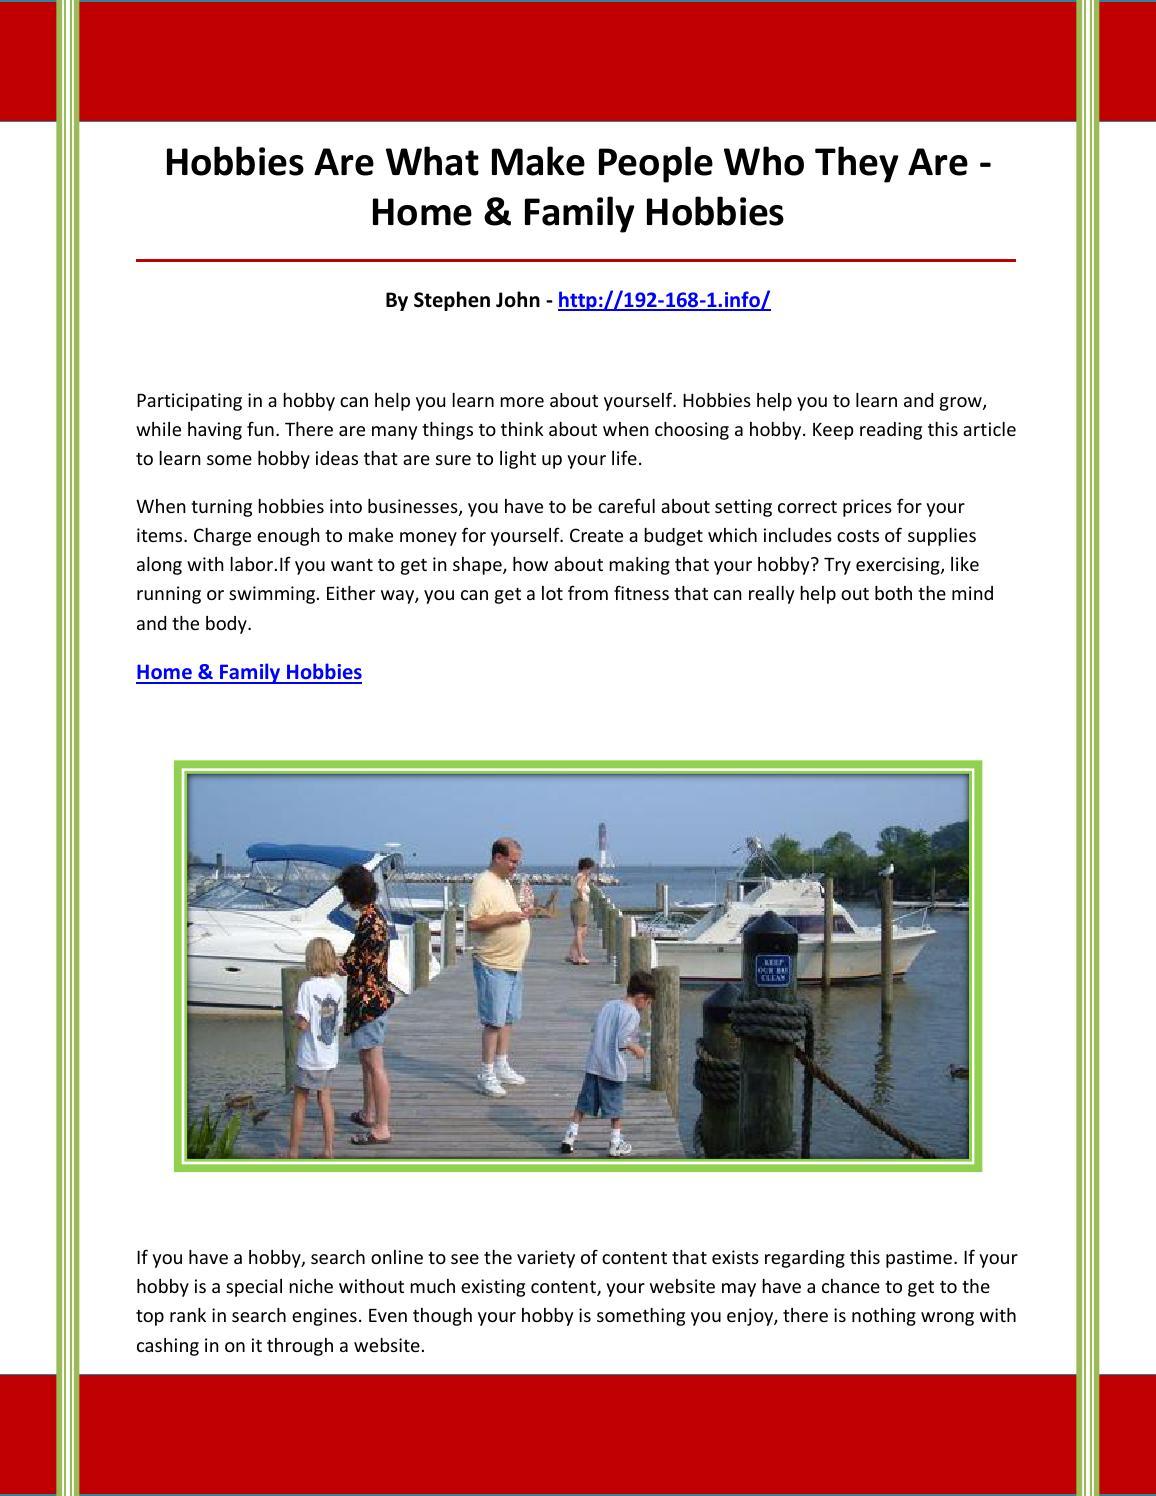 Home & family hobbies, by nbhvbfgcvdfcgdbvchd - issuu